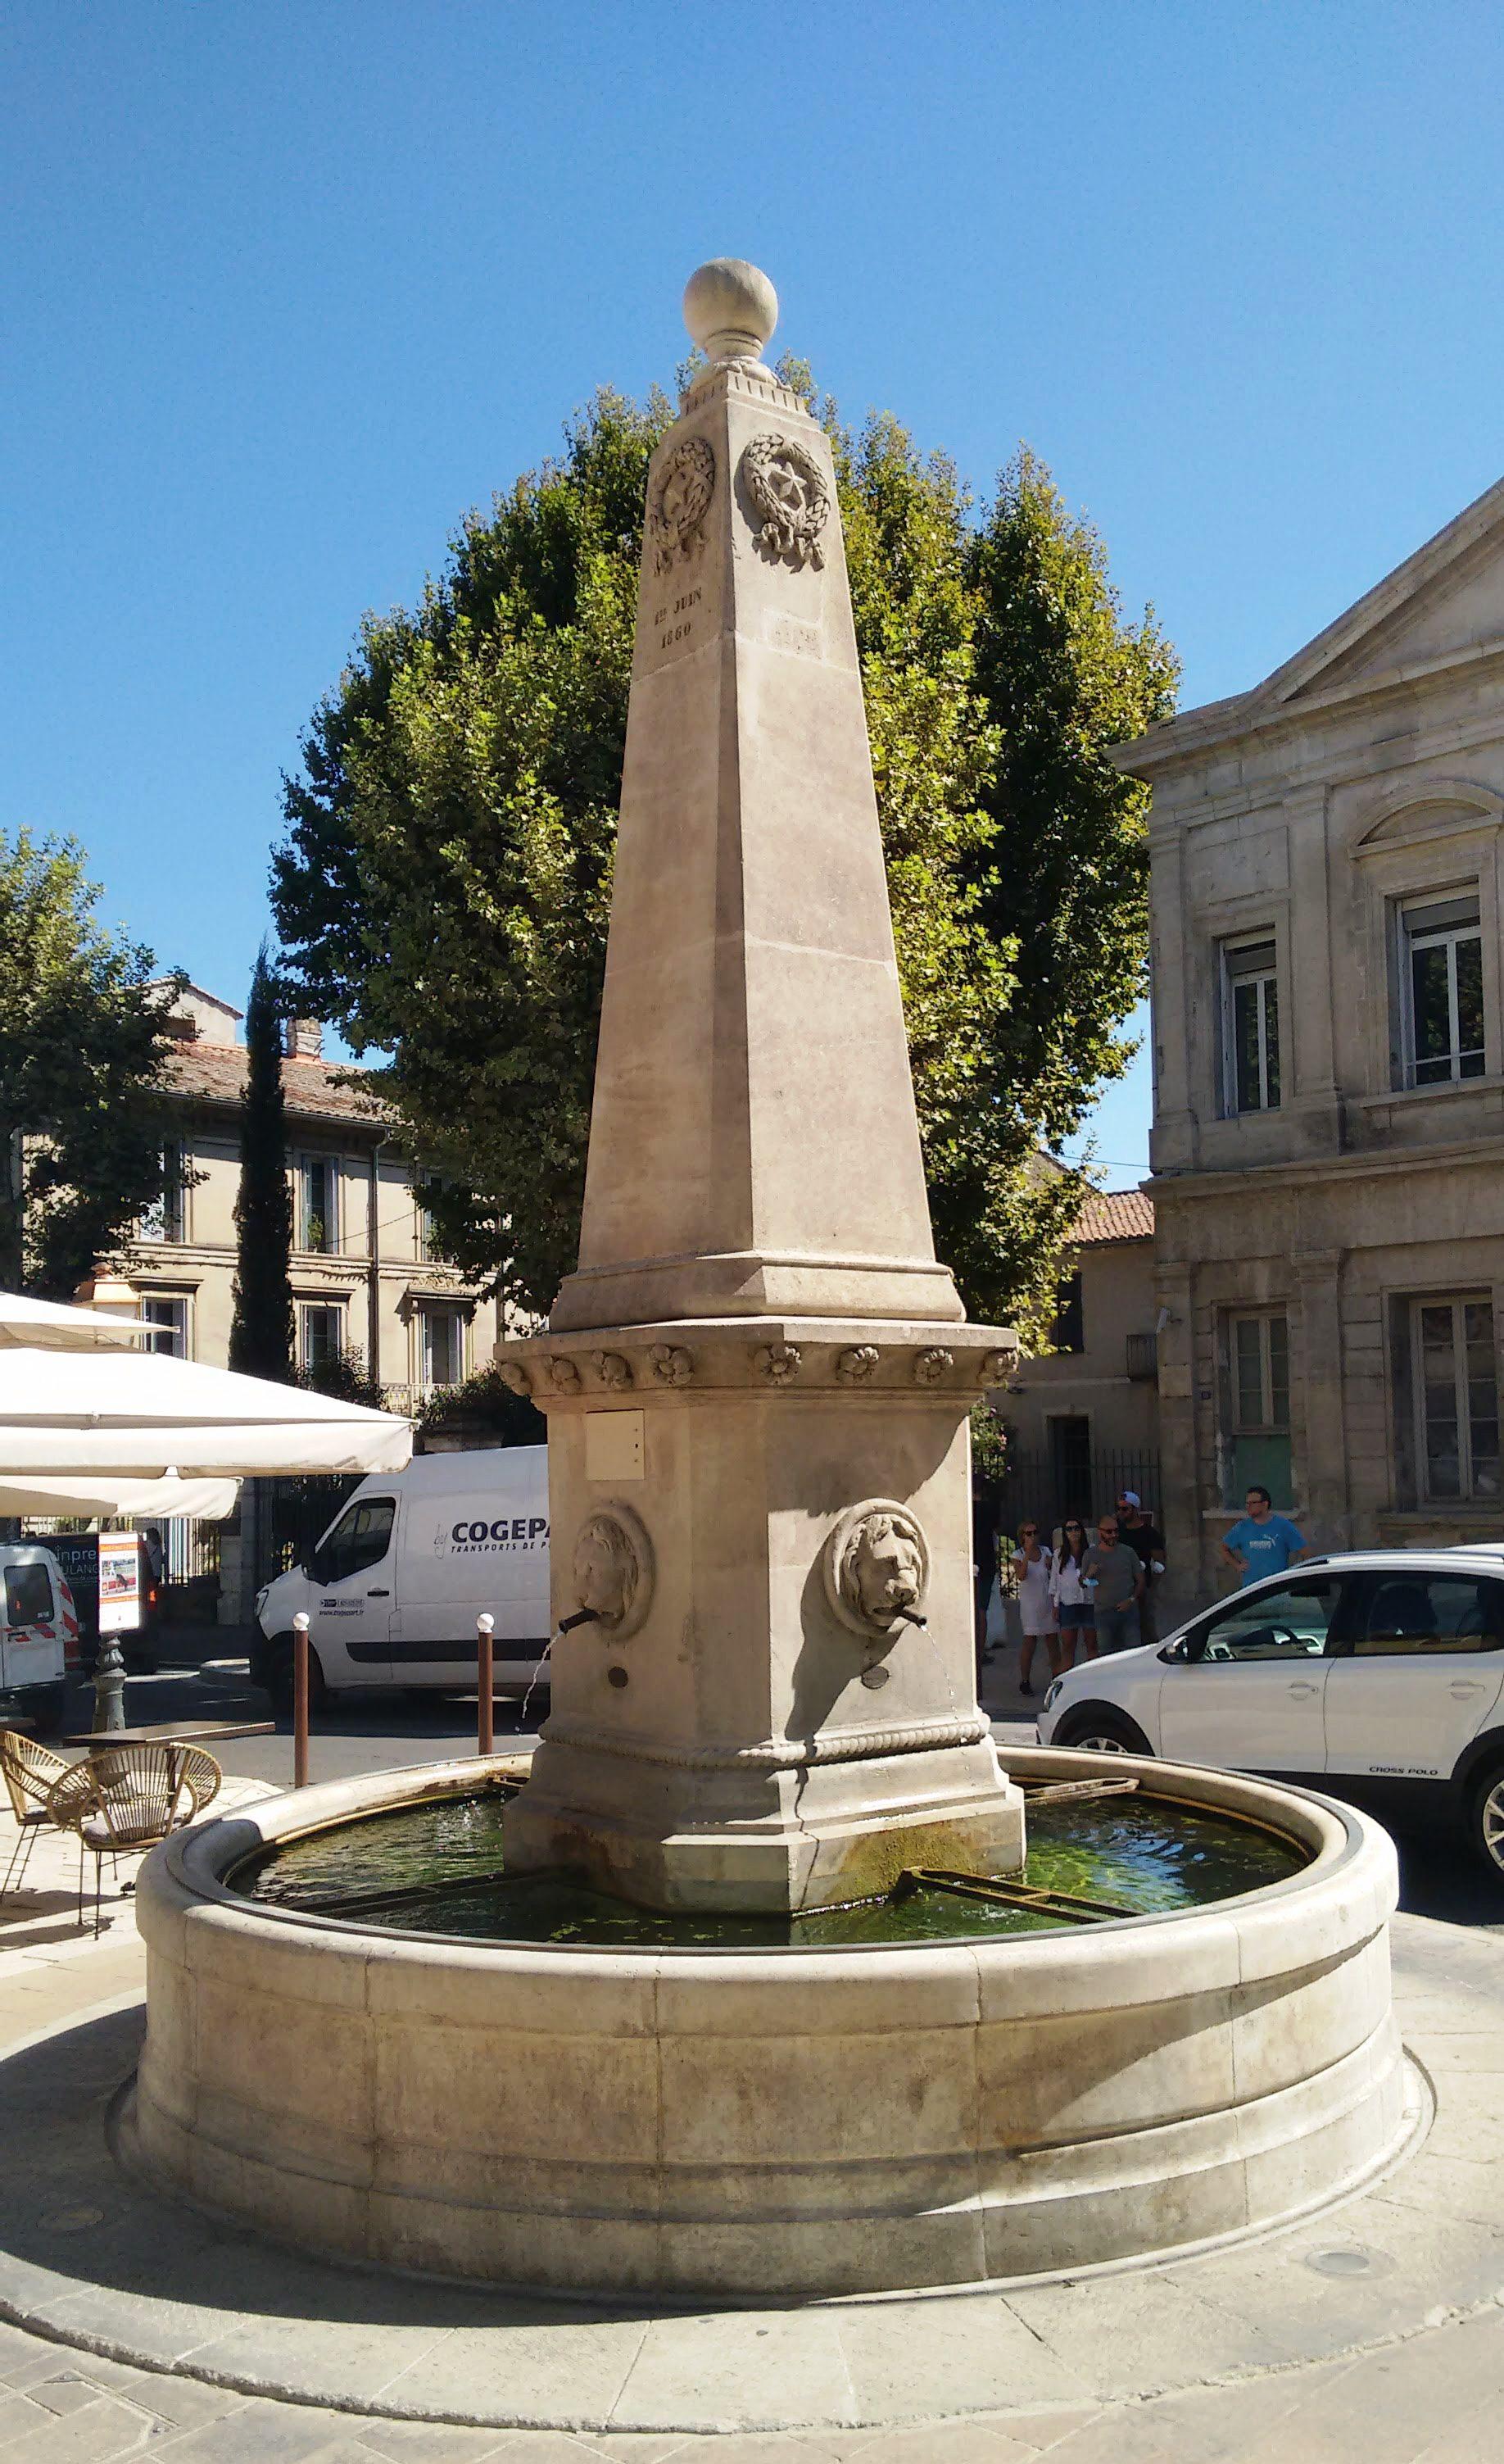 Cafe de la Fontaine fountain